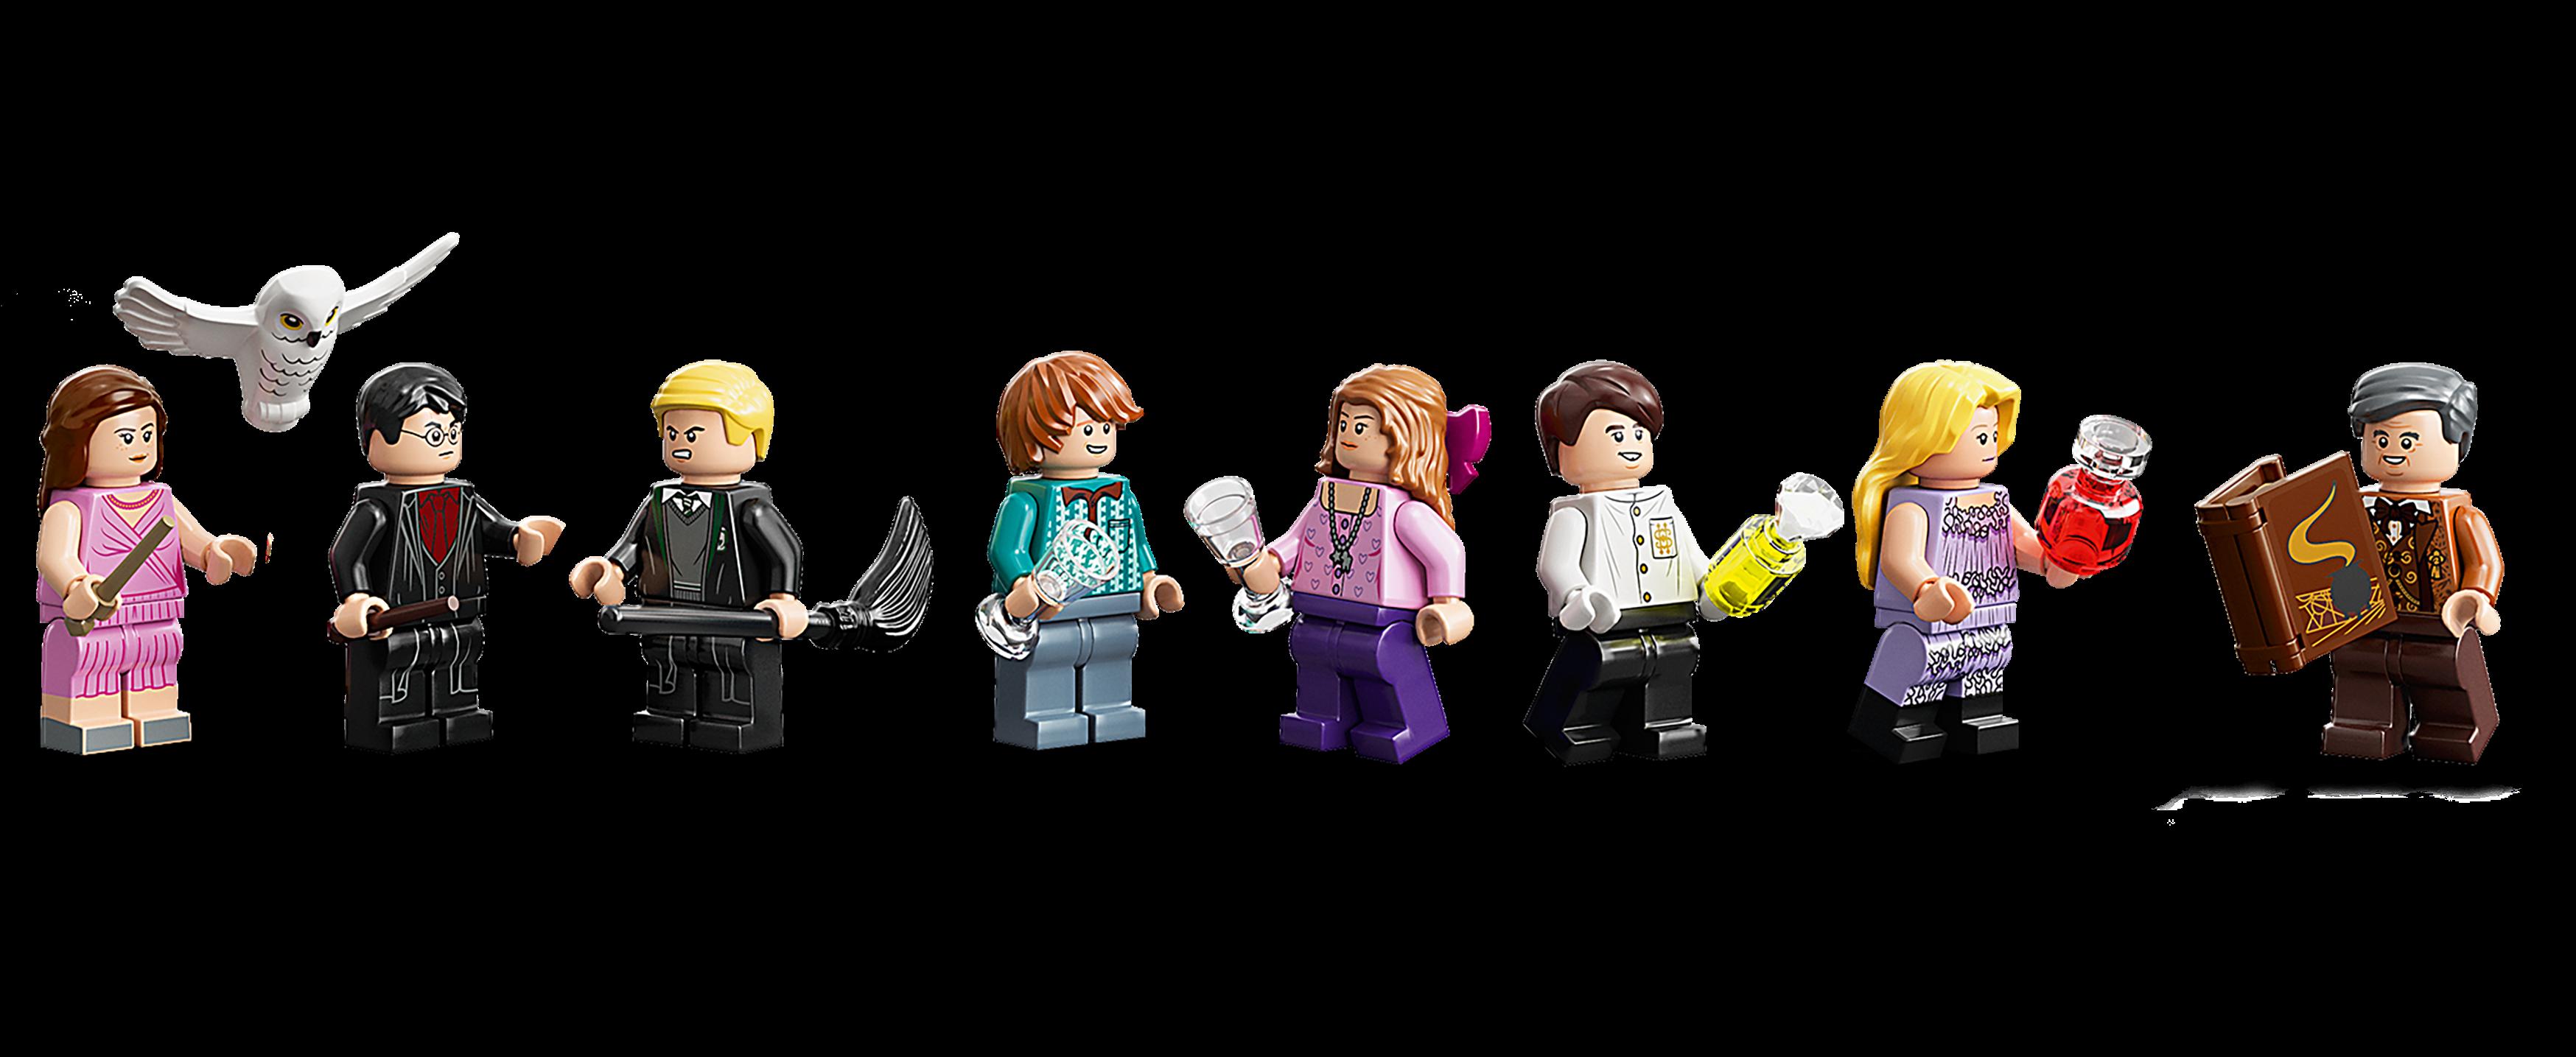 Hogwarts Astronomy Tower Ad Hogwarts Paid Astronomy Tower Lego Harry Potter Harry Potter Lego Sets Harry Potter